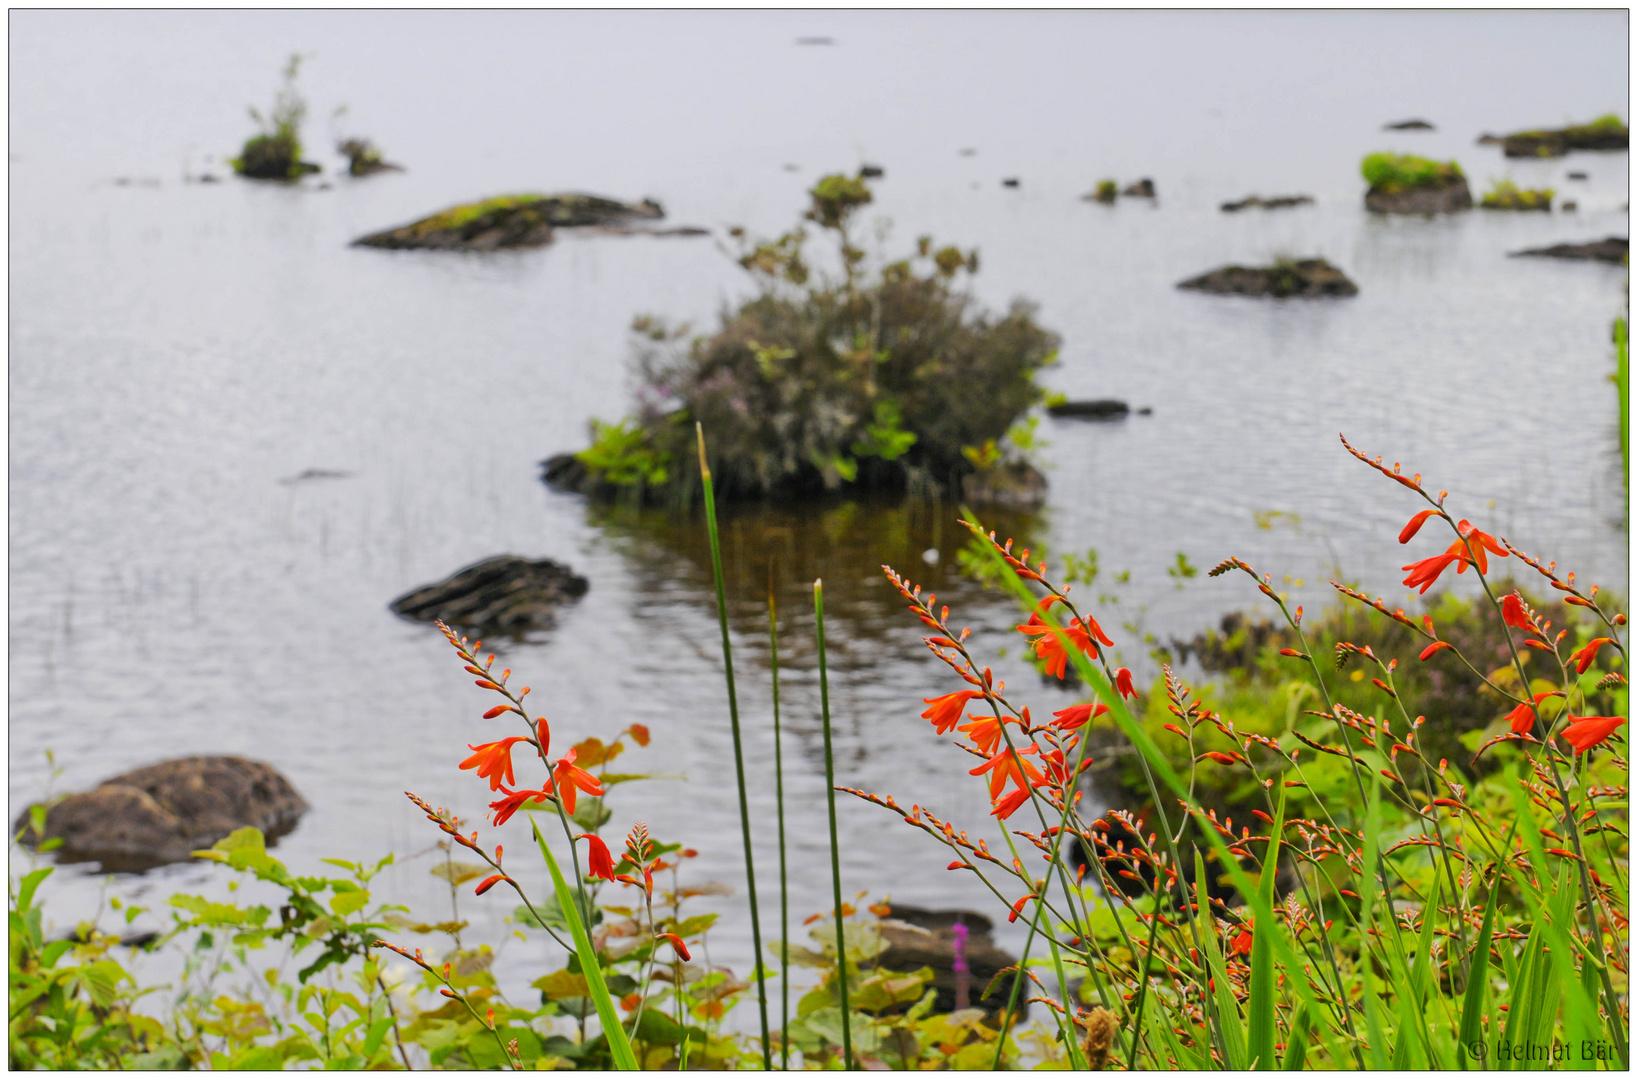 Am Lough Eske